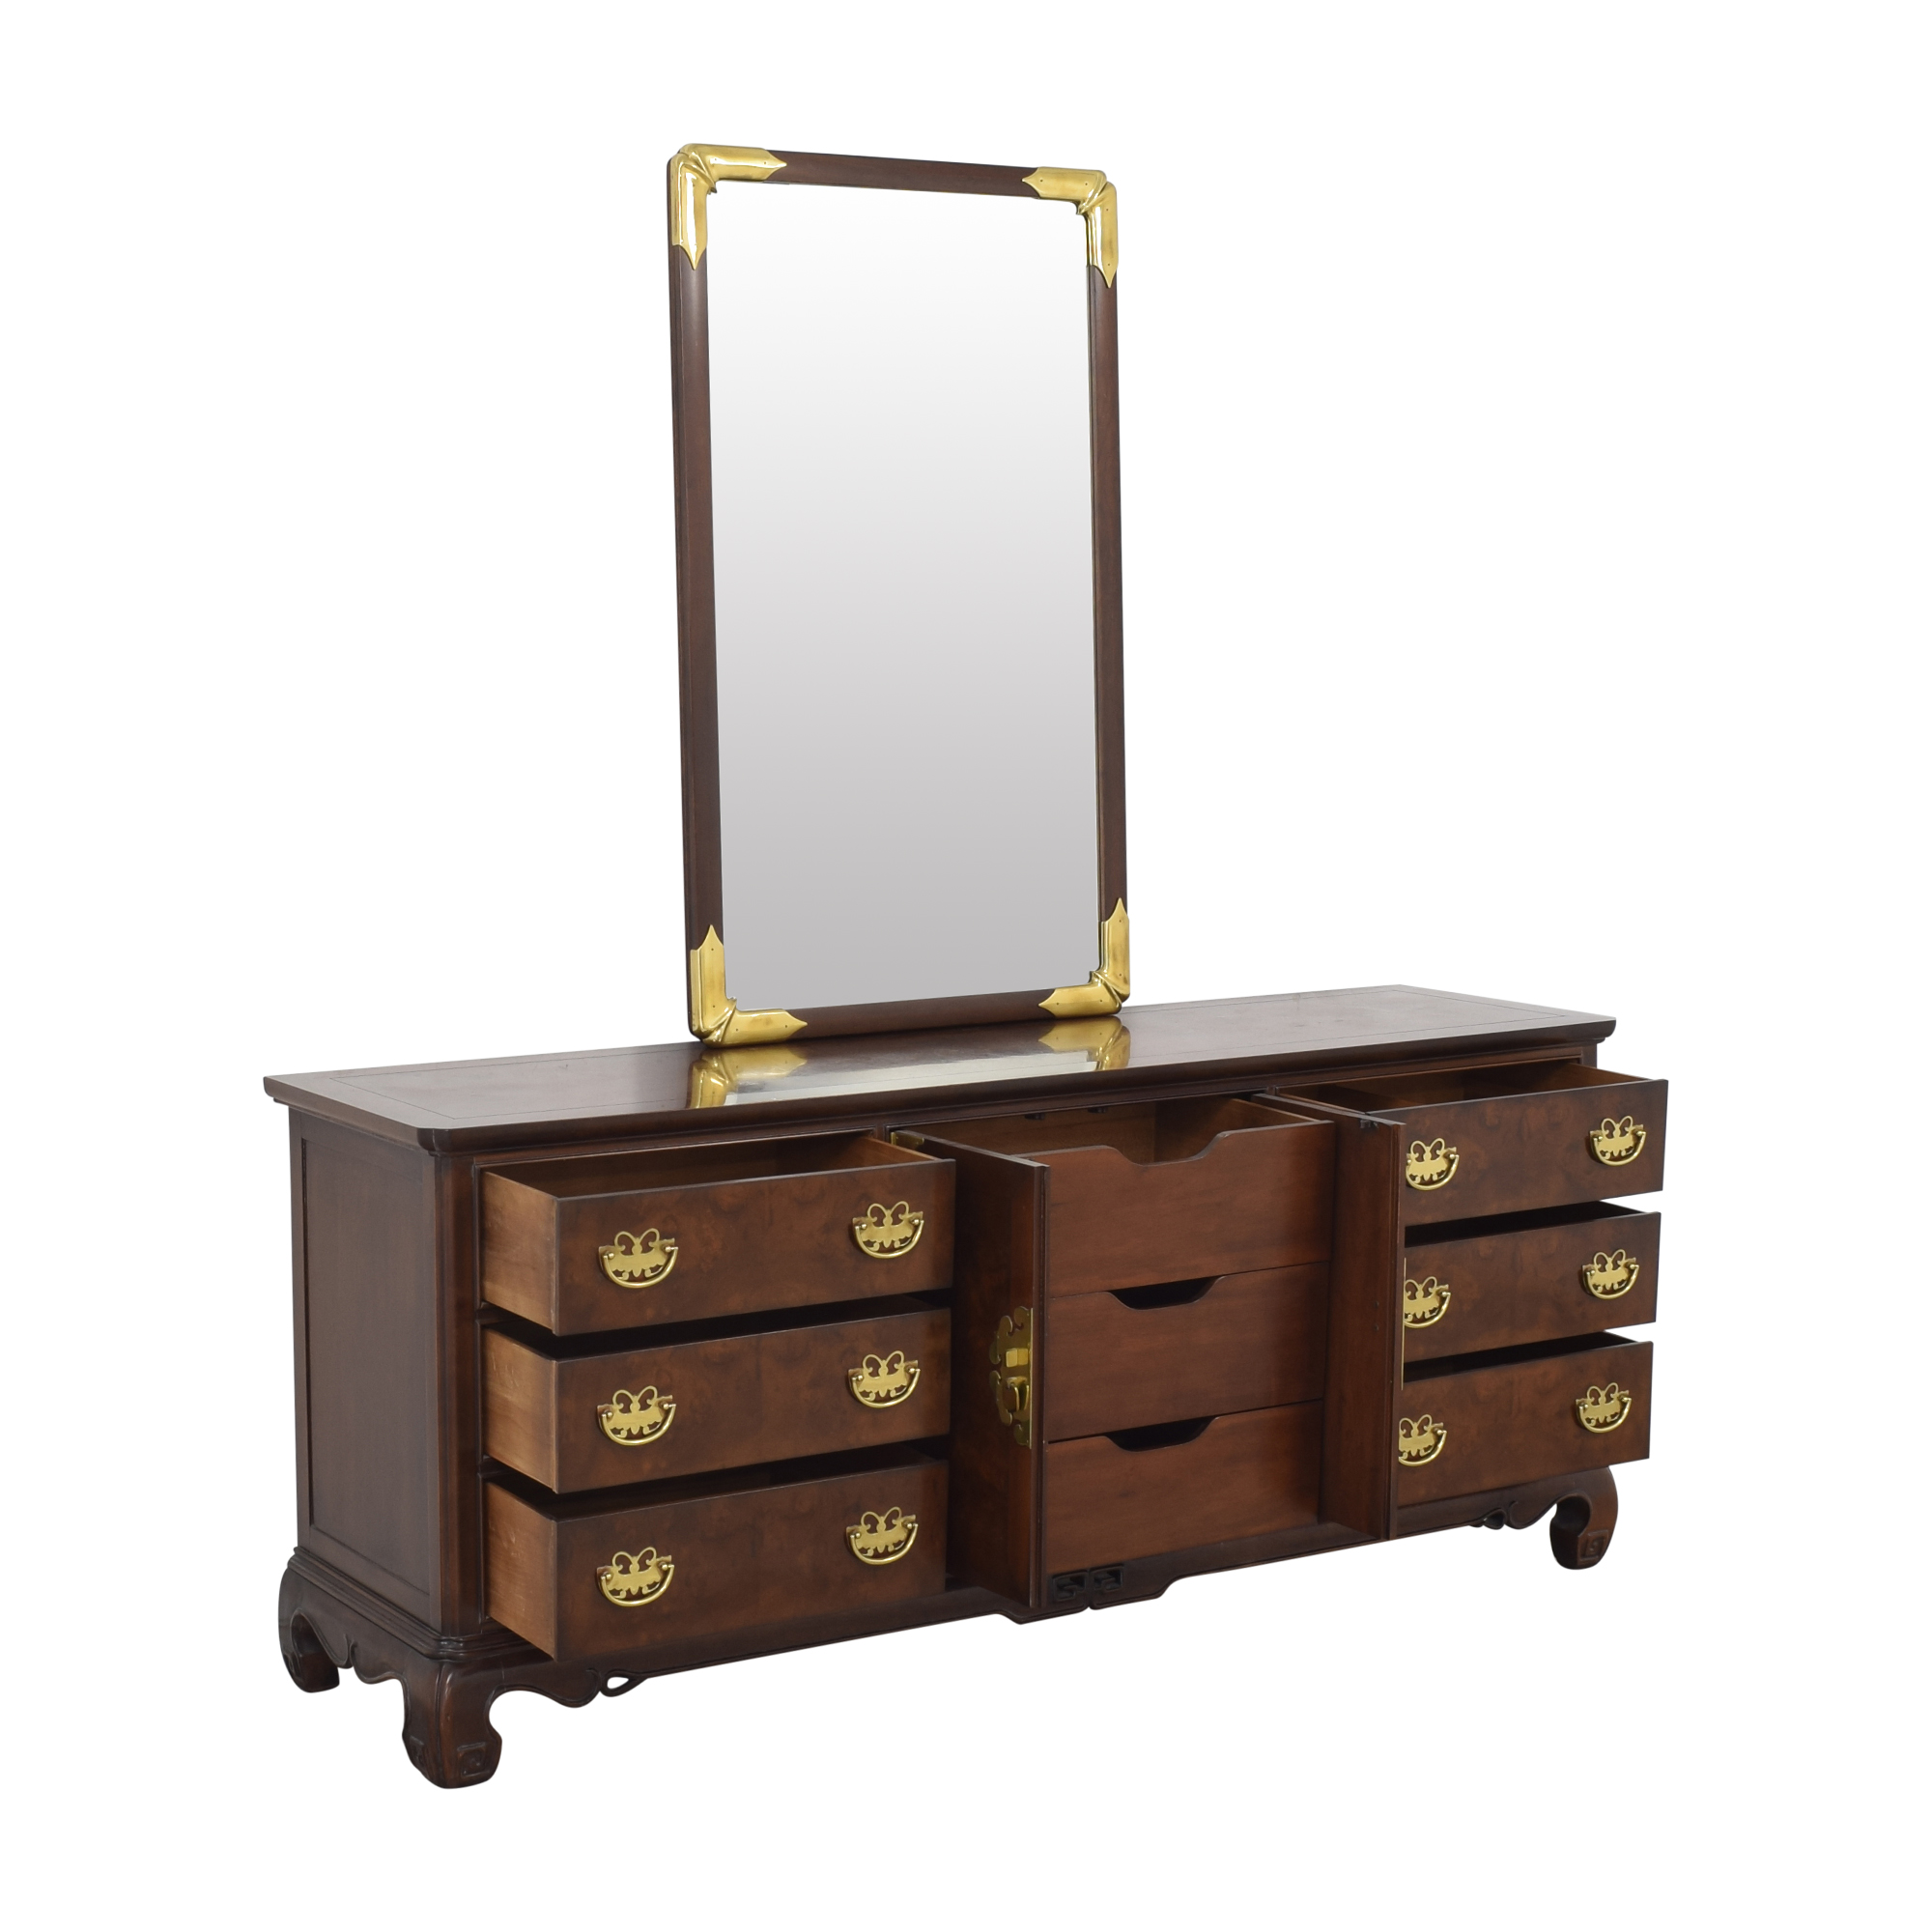 Heritage Henredon Heritage Henredon Dresser with Mirror nj